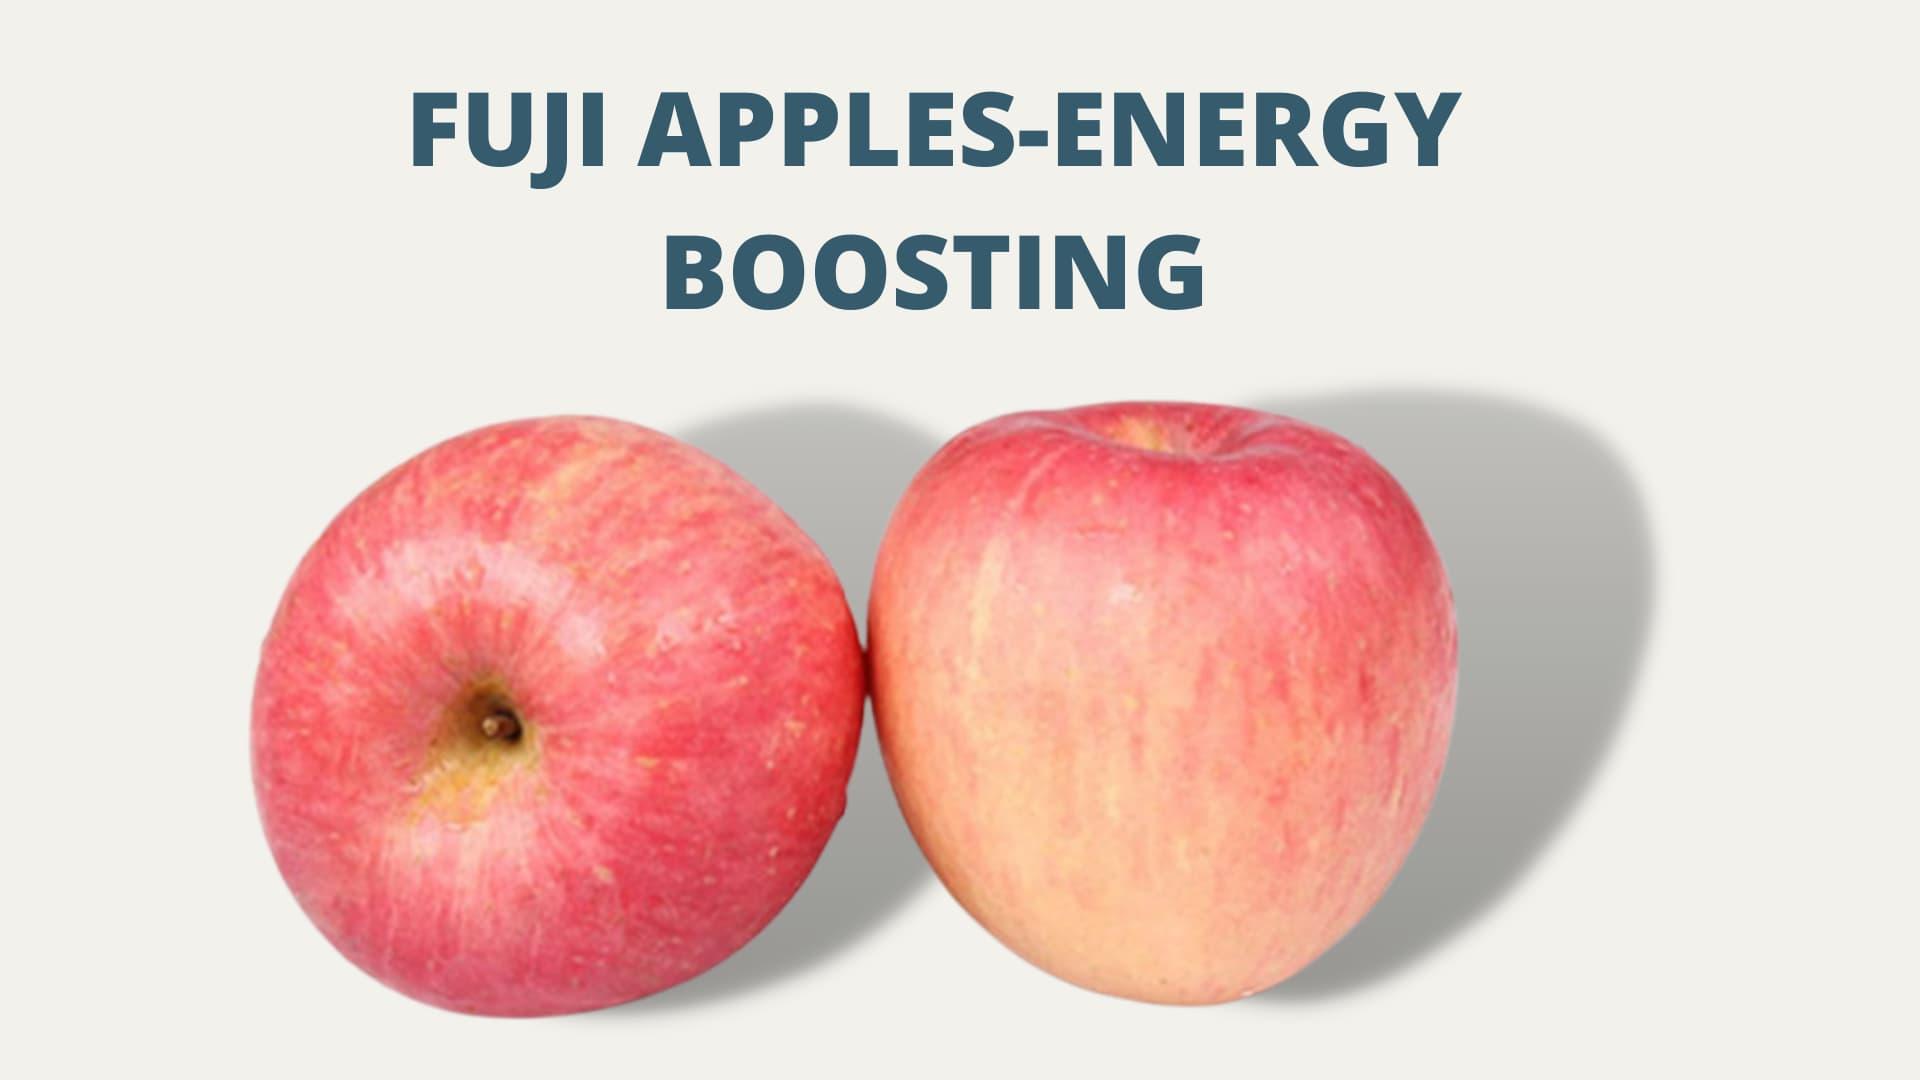 Fuji Apples-Energy Boosting